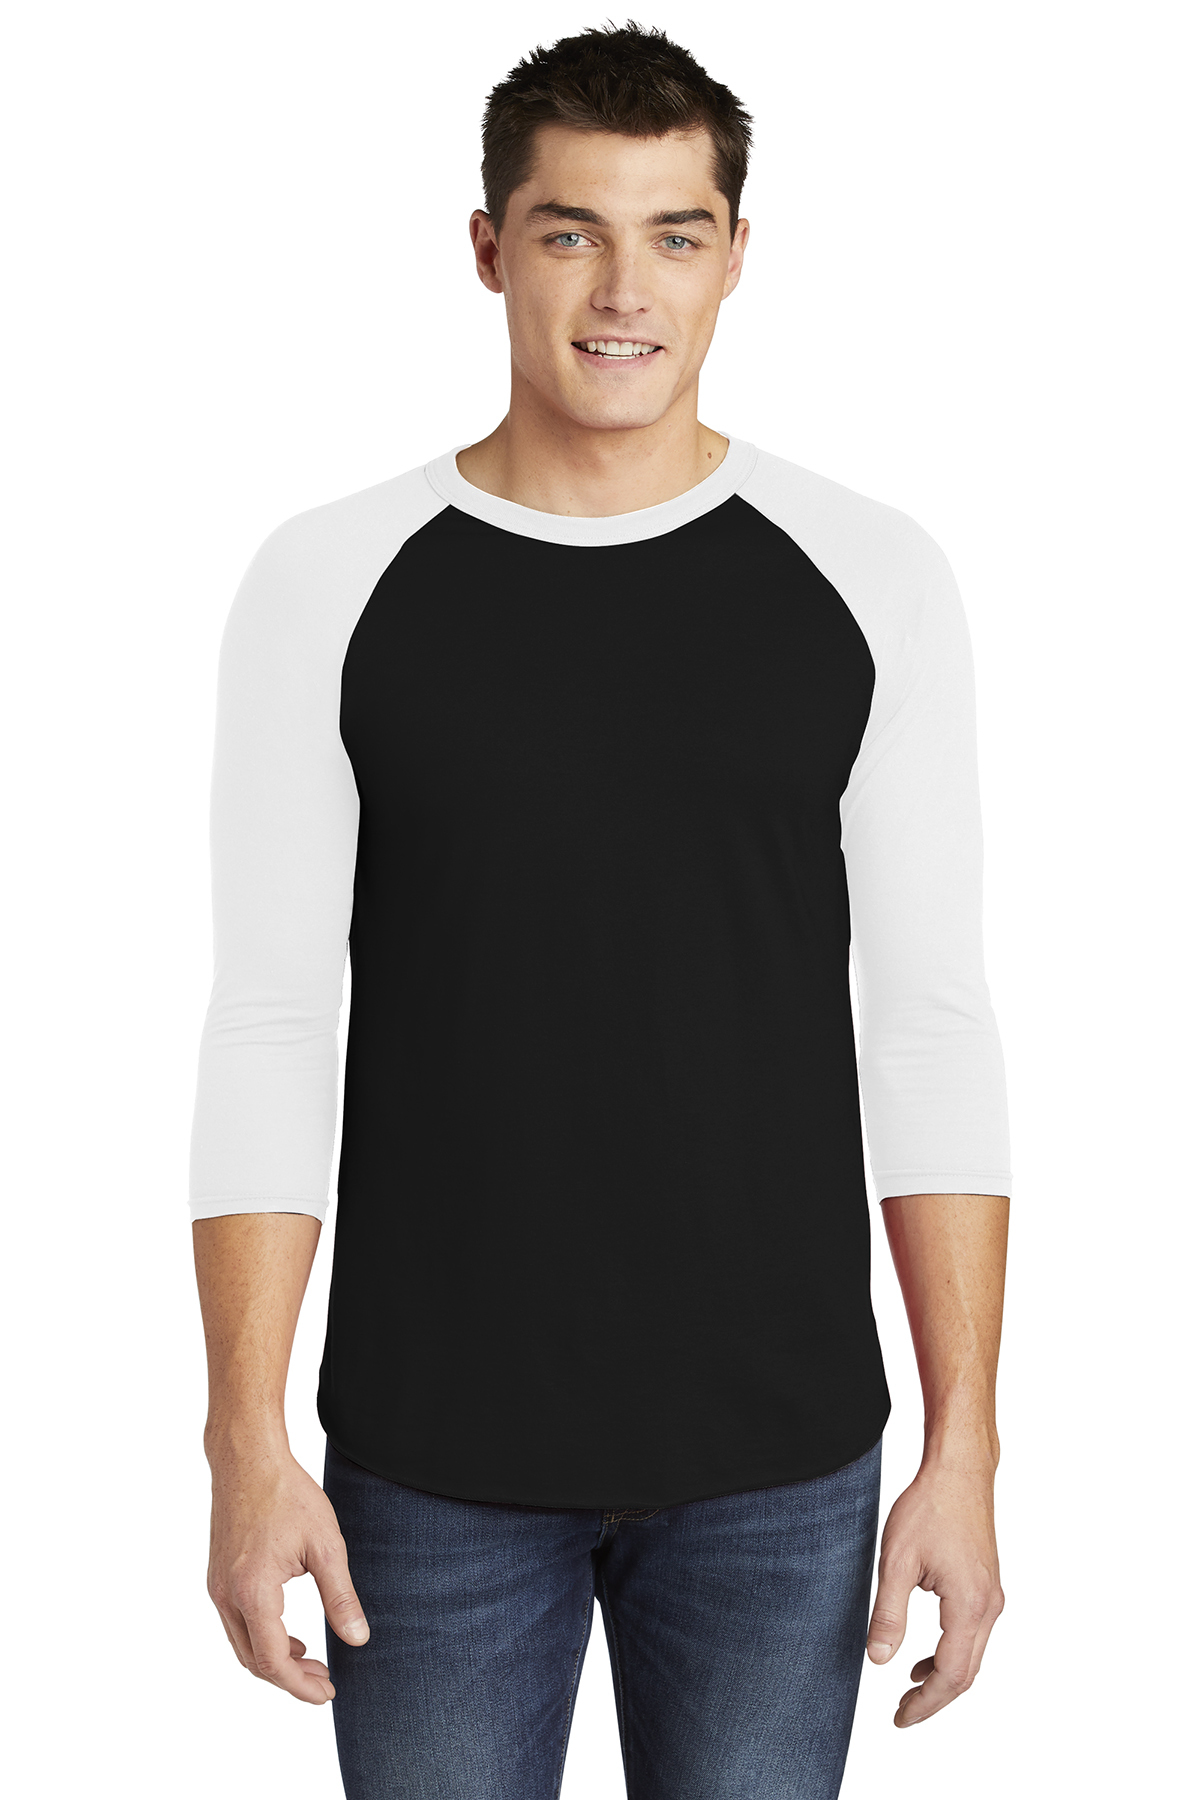 6b684d4e American Apparel ® Poly-Cotton 3/4-Sleeve Raglan T-Shirt | 50/50 ...